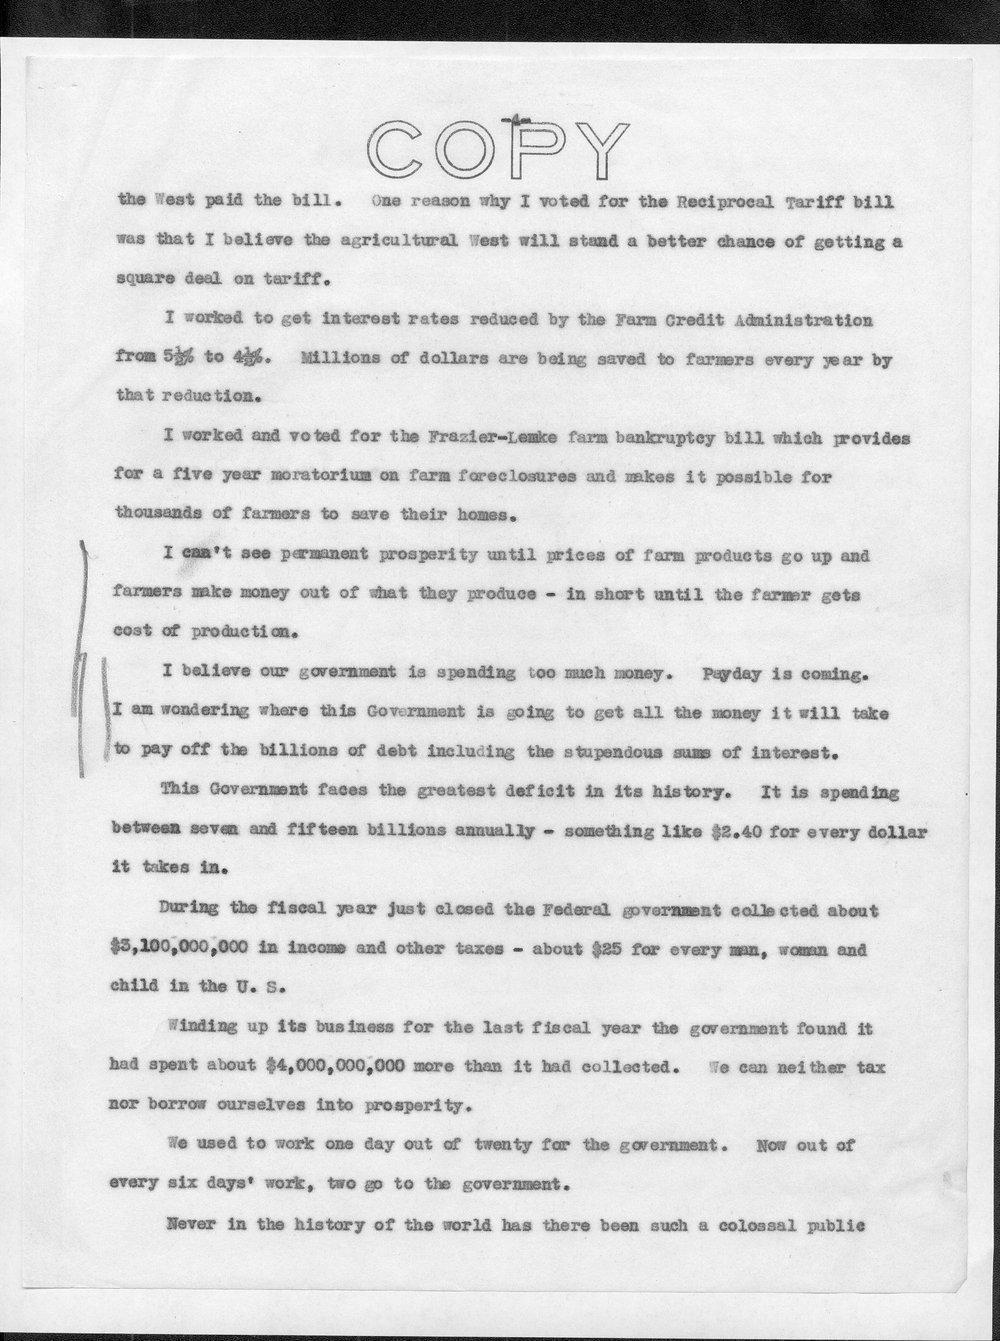 Draft of Senator Arthur Capper's New Deal speech - 4